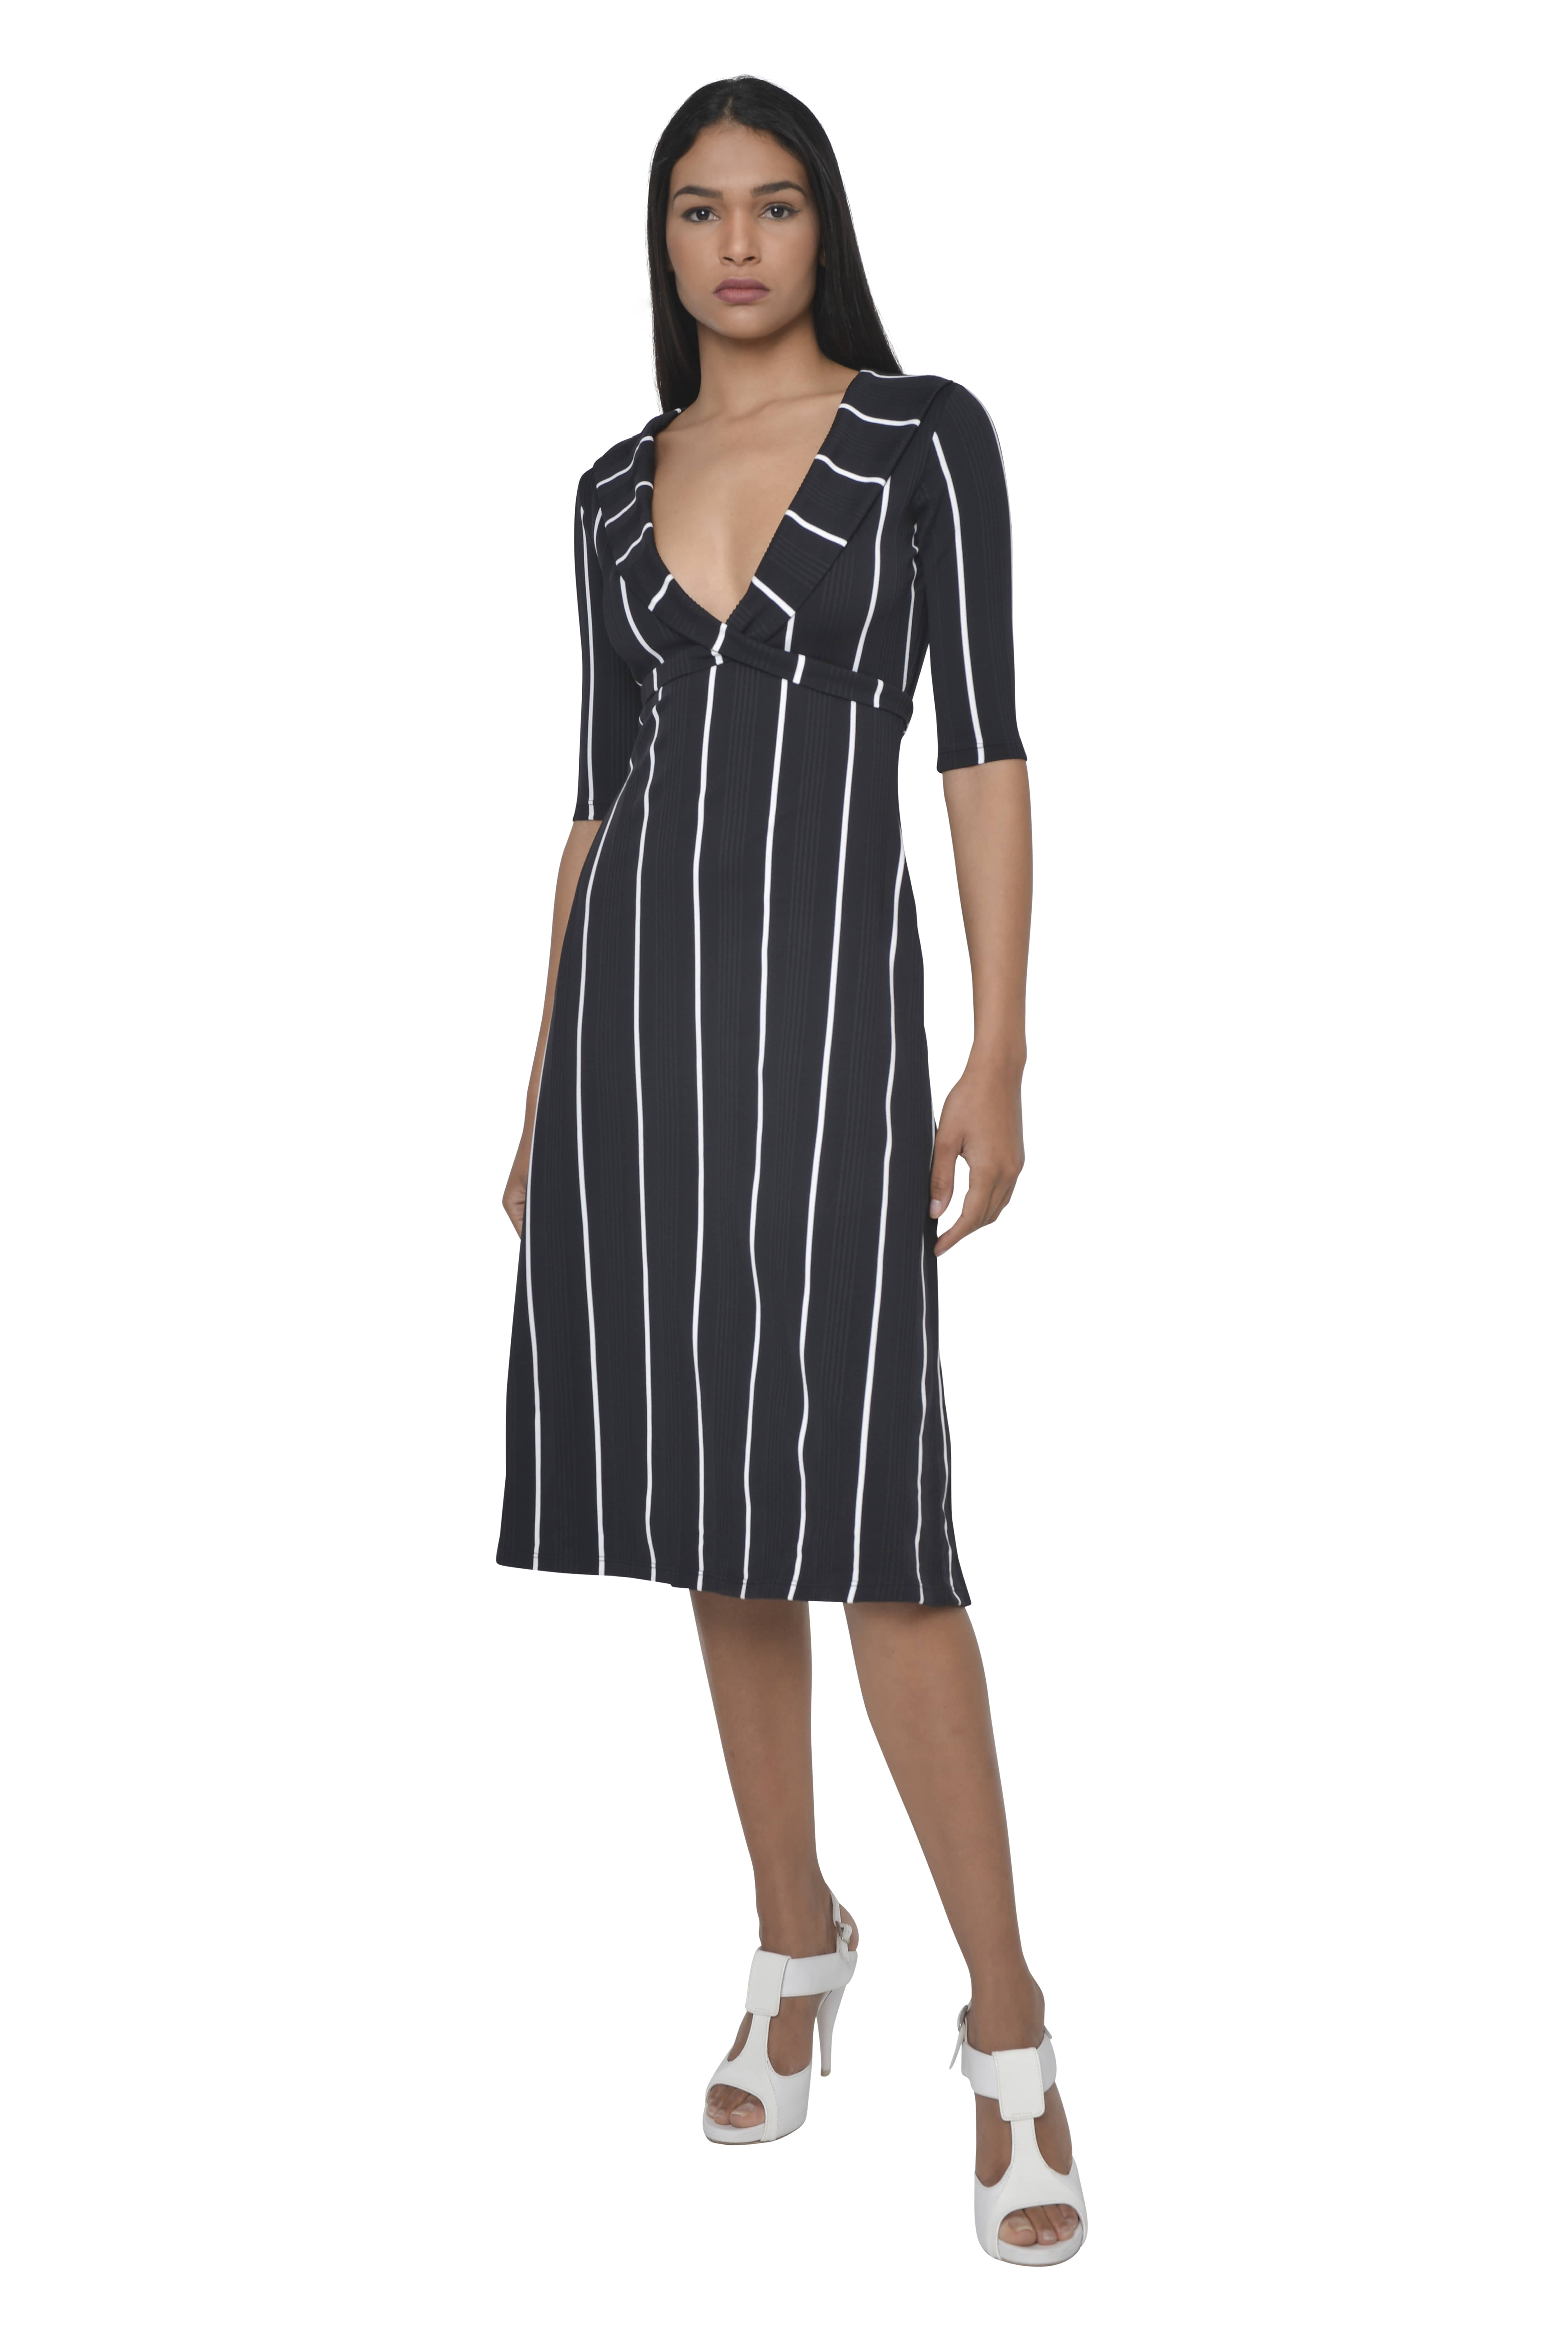 Dress AGAPANTO 0